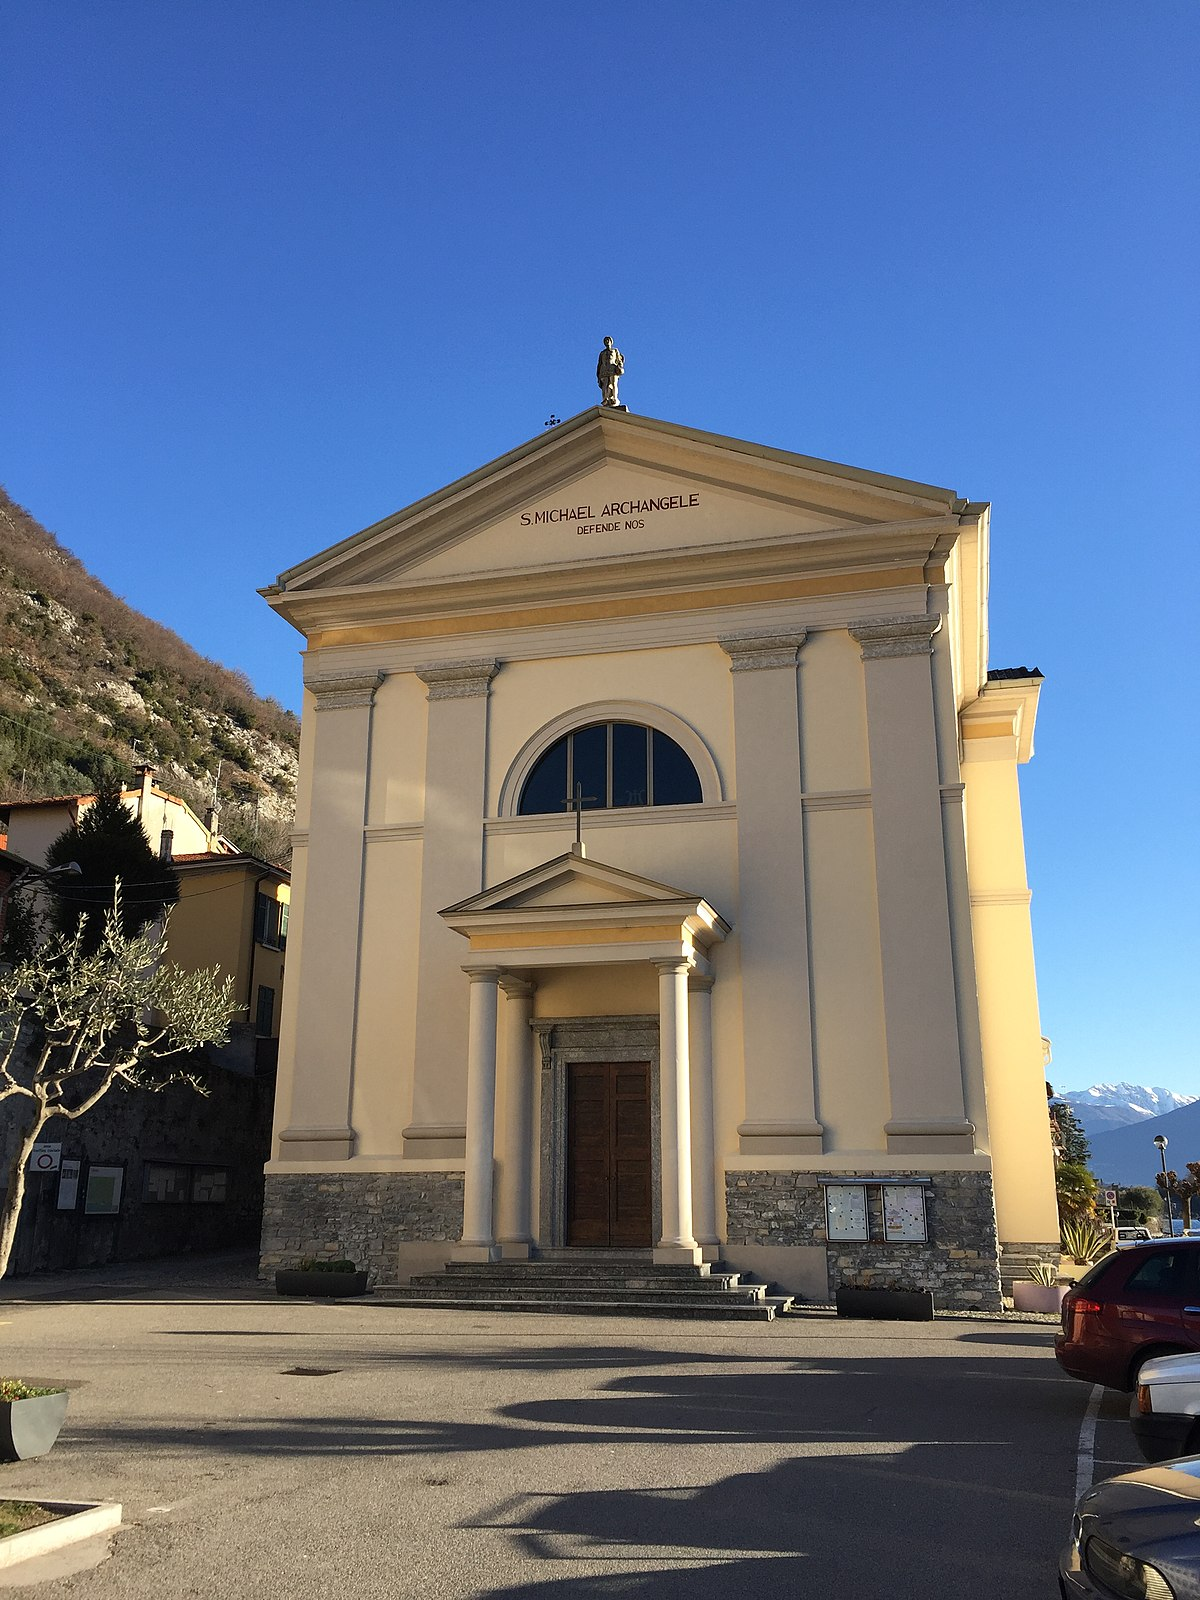 Sant Abbondio A Como Le Pitture Murali  jakarta 2022